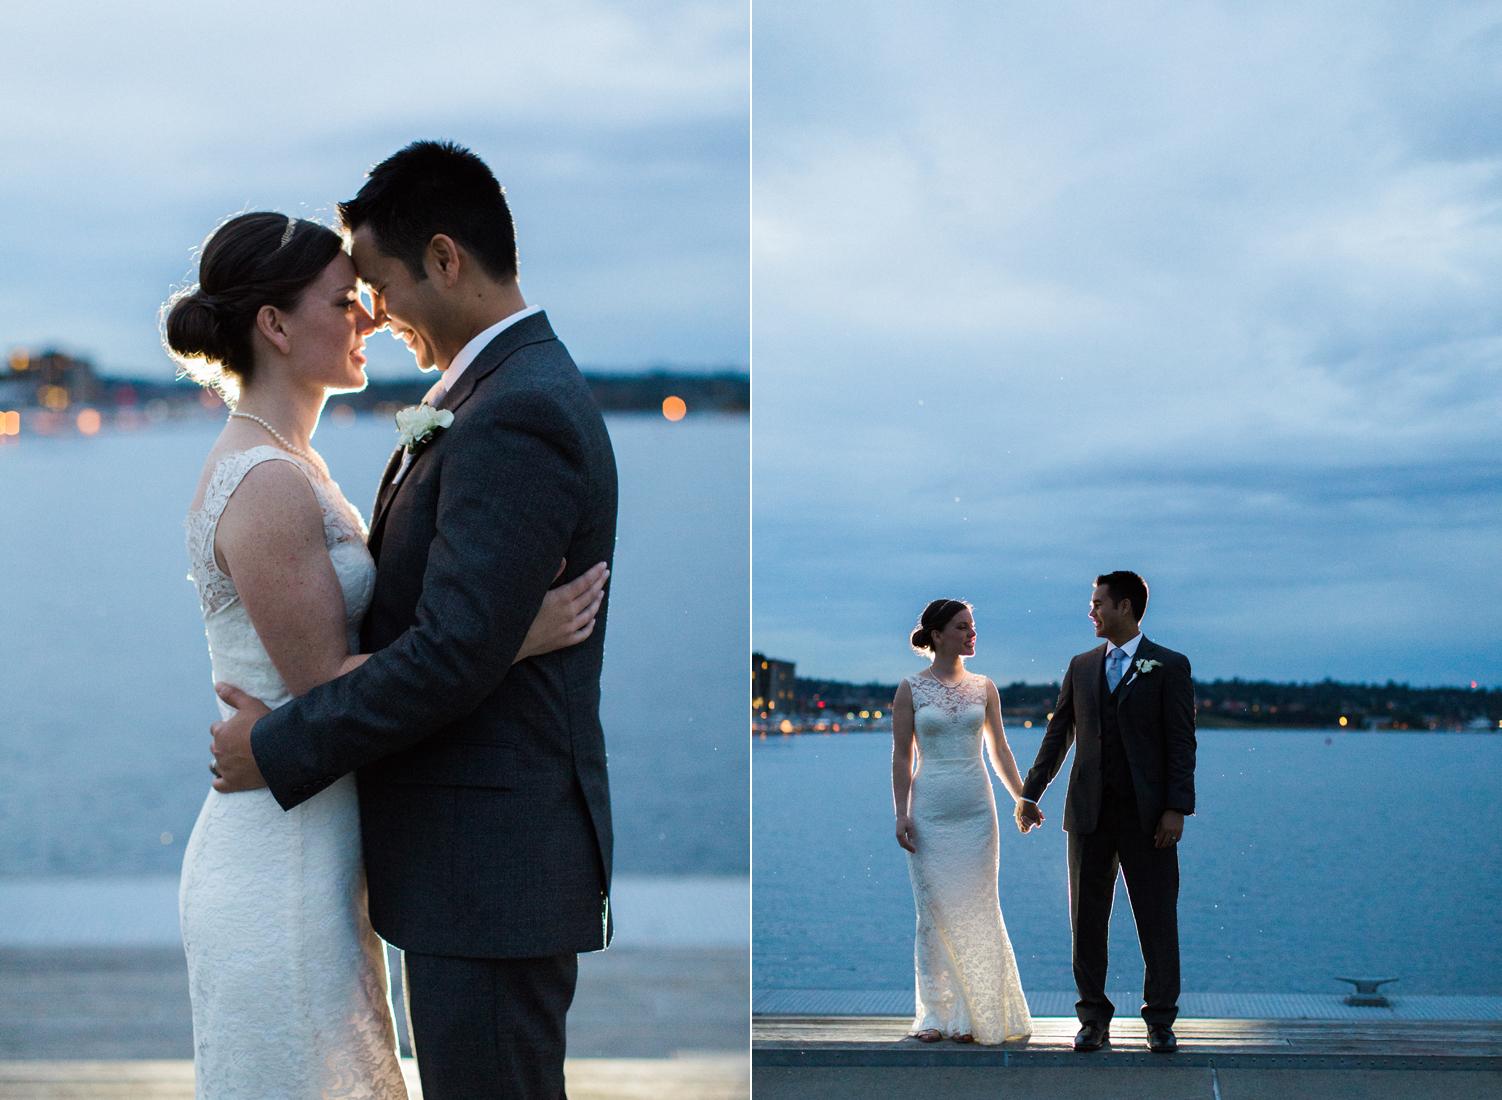 seattle blue hour wedding portrait photography.jpg